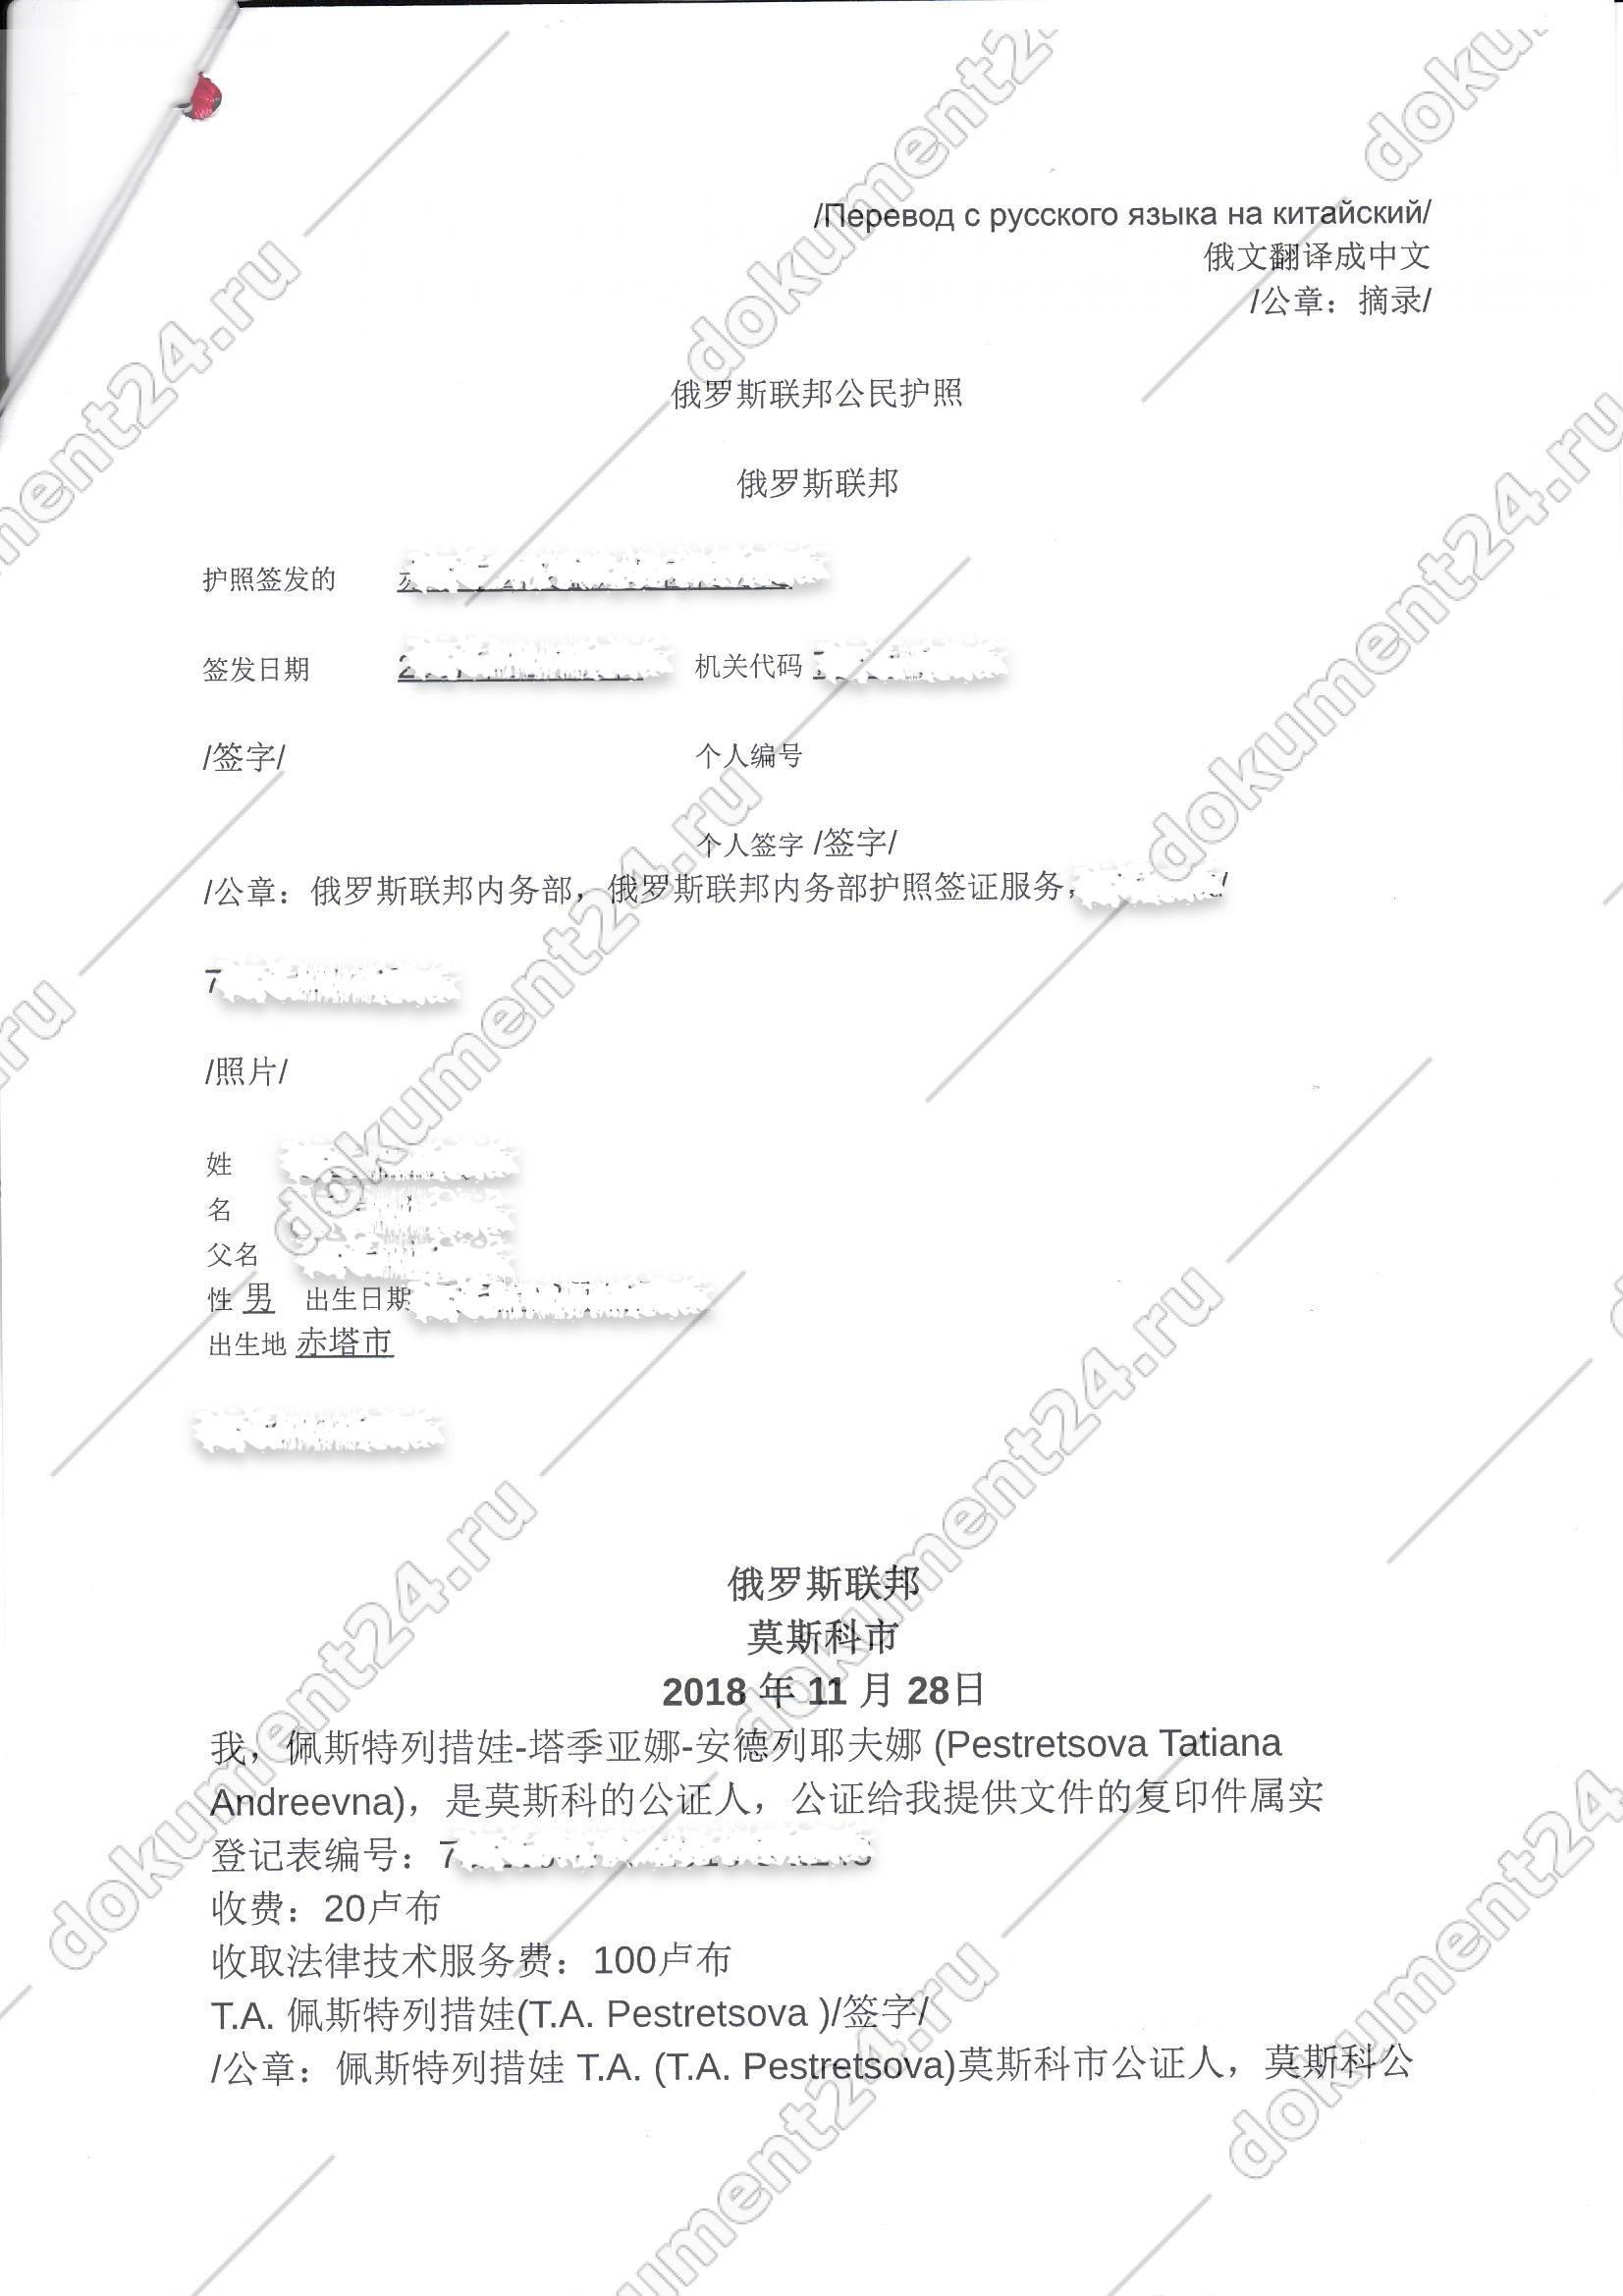 perevod rossiiskogo pasporta kitaiskii